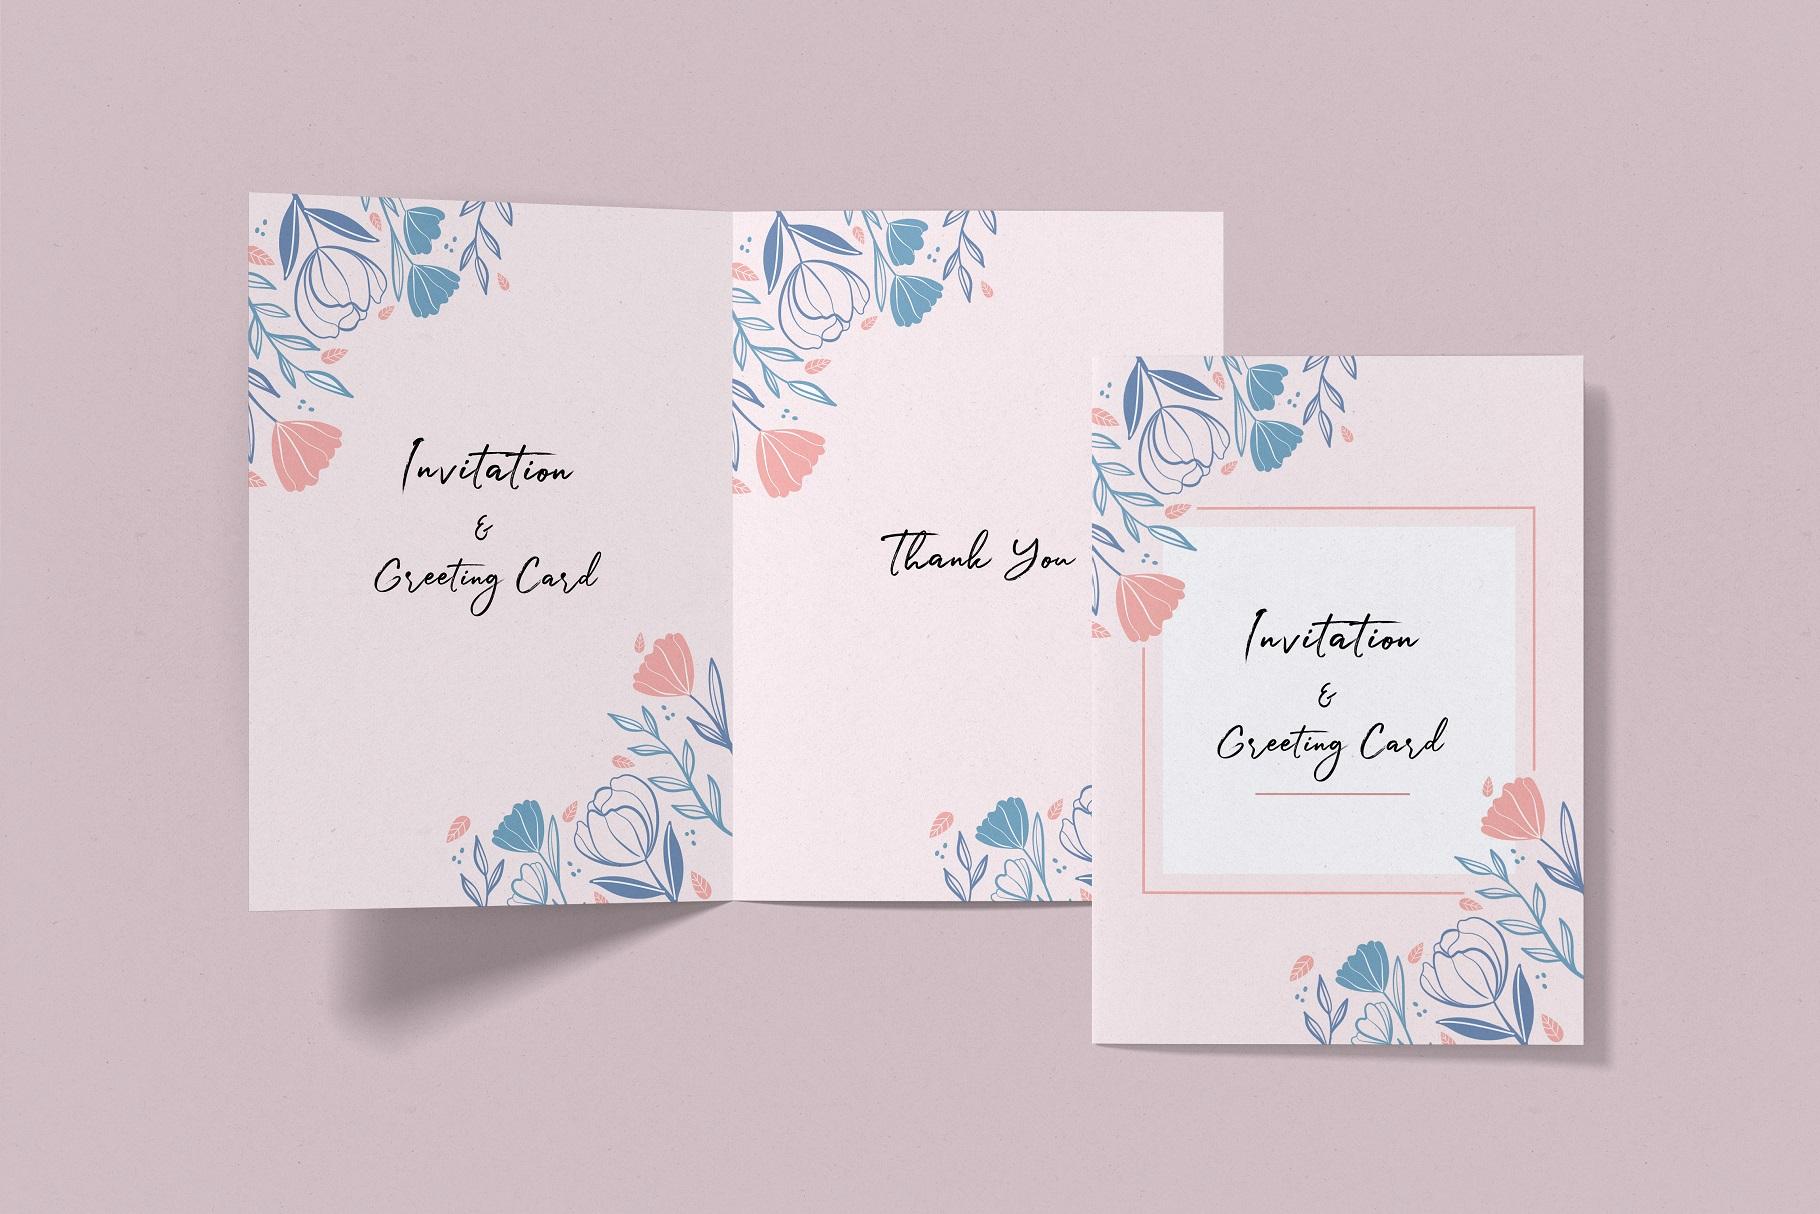 Invitation & Greeting Card Mockup example image 10